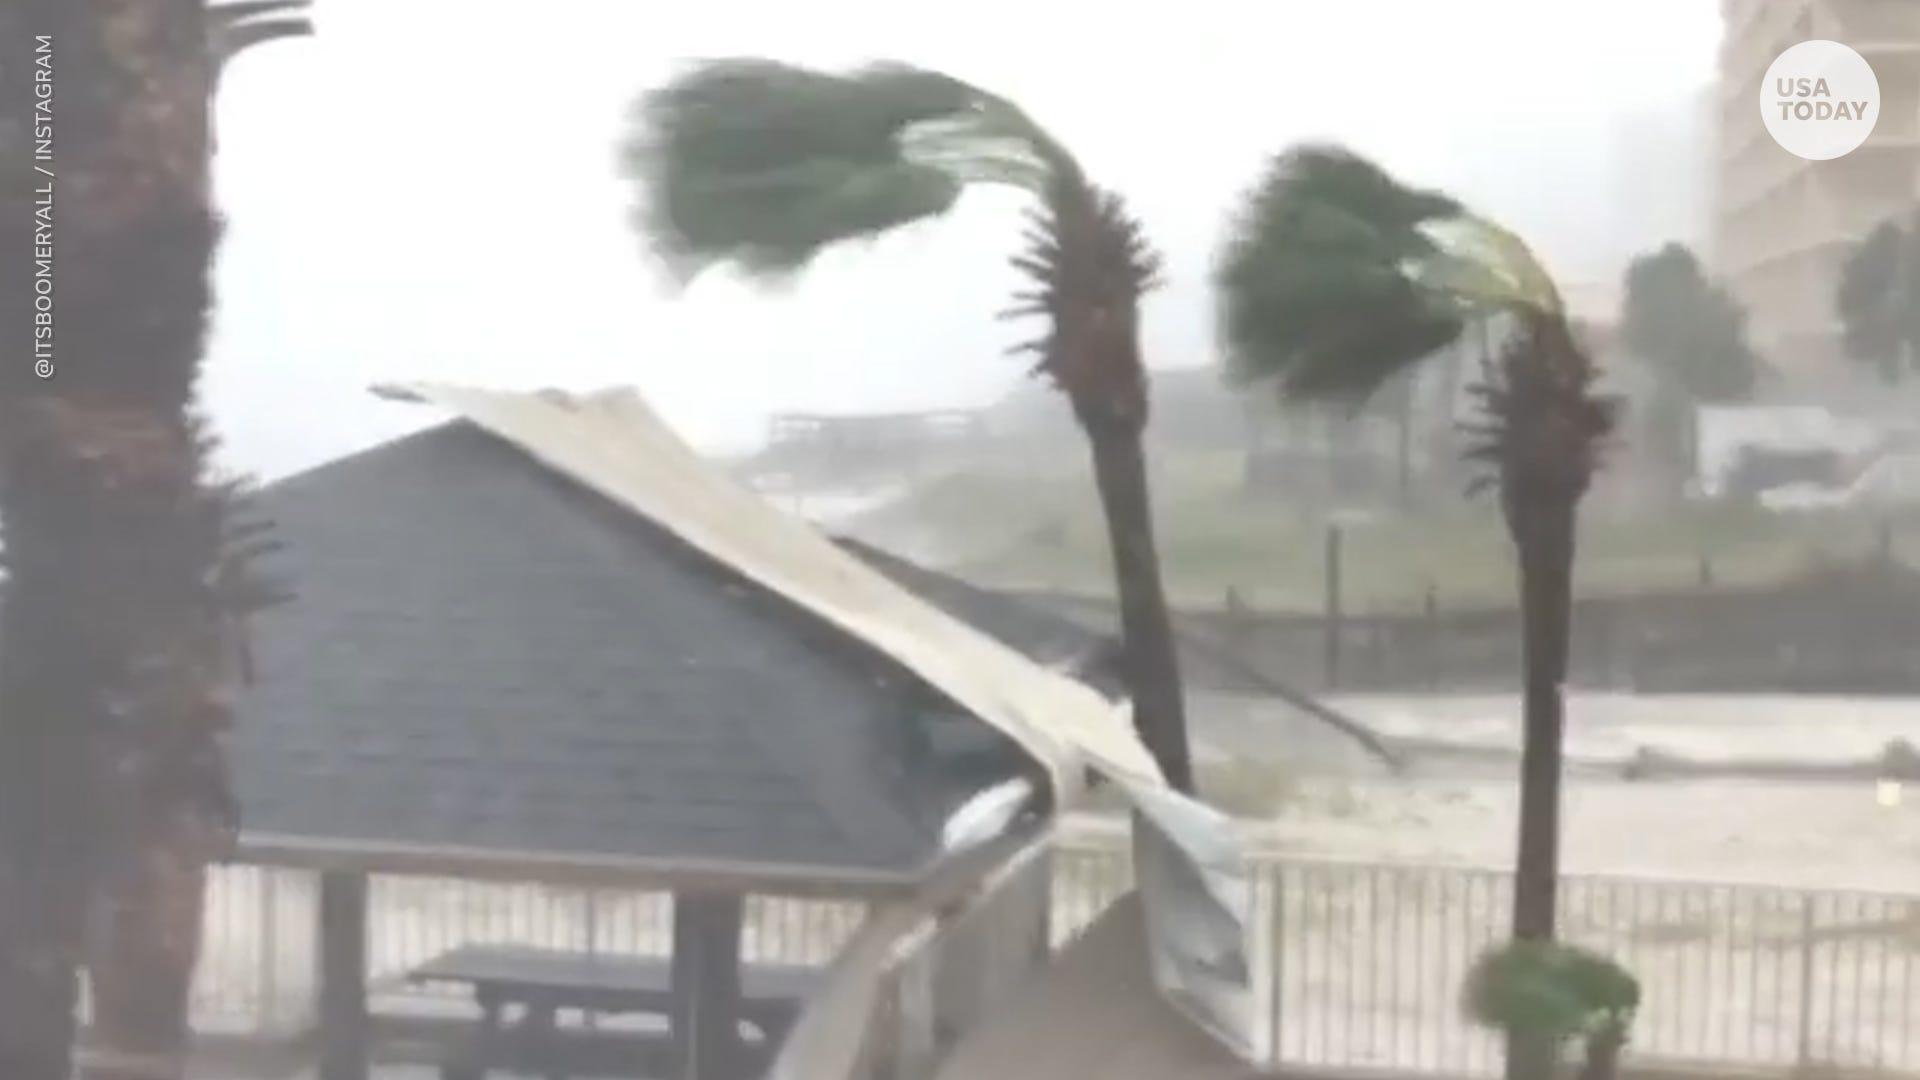 Debris flying at Panama City Beach during Hurricane Michael